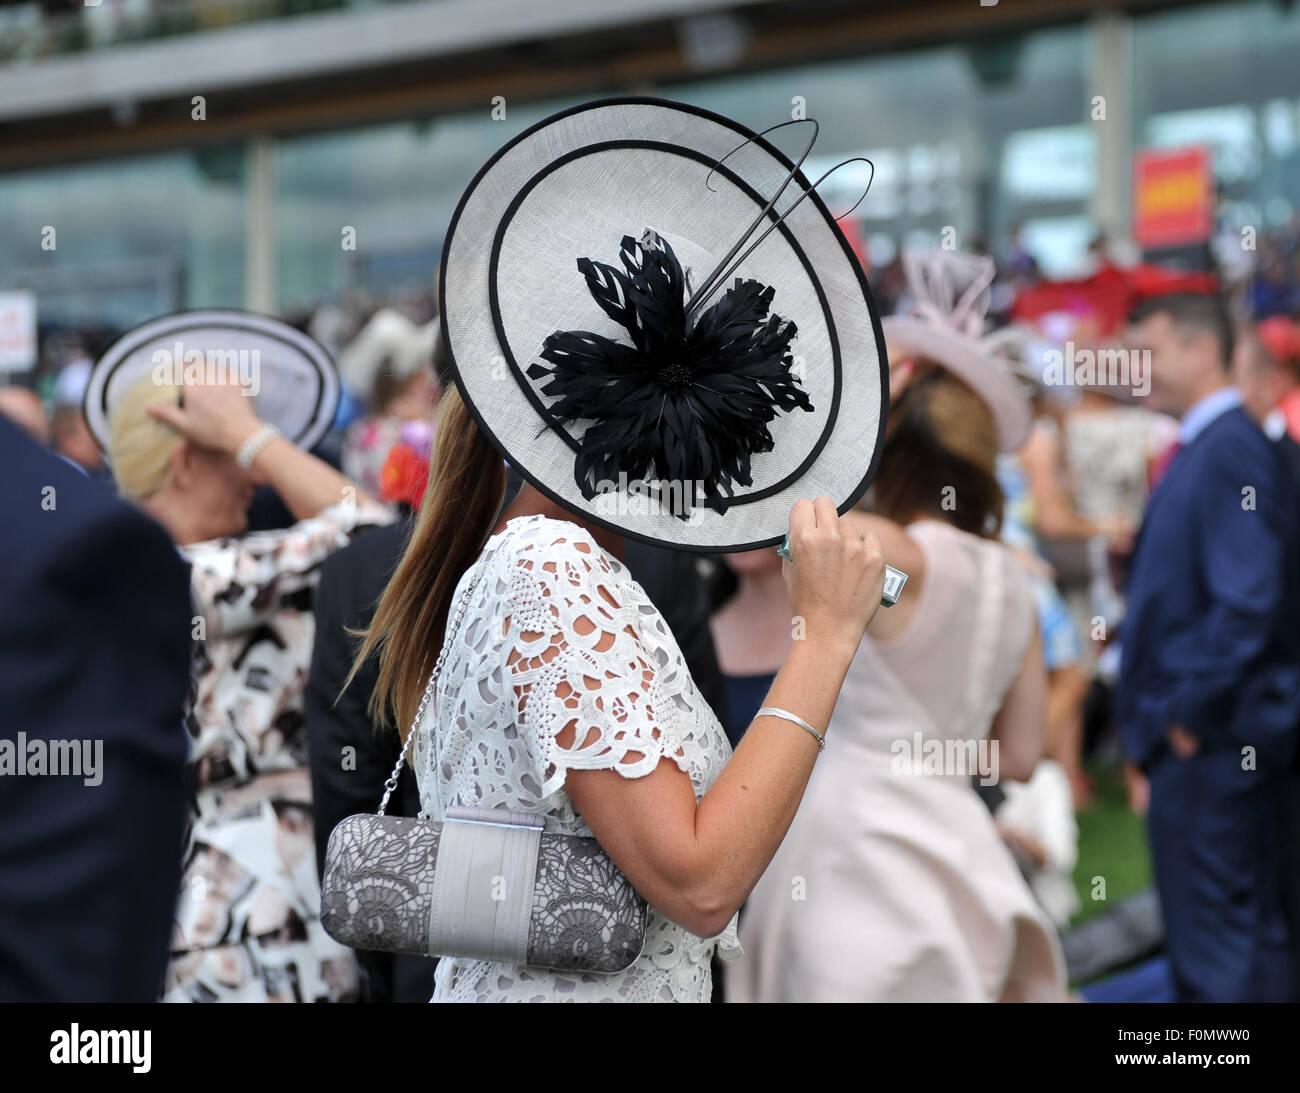 Royal Ascot 2015 celebrada en el hipódromo de Ascot - Día 2 donde: Ascot, Reino Unido cuando: 16 Jun 2015 Imagen De Stock